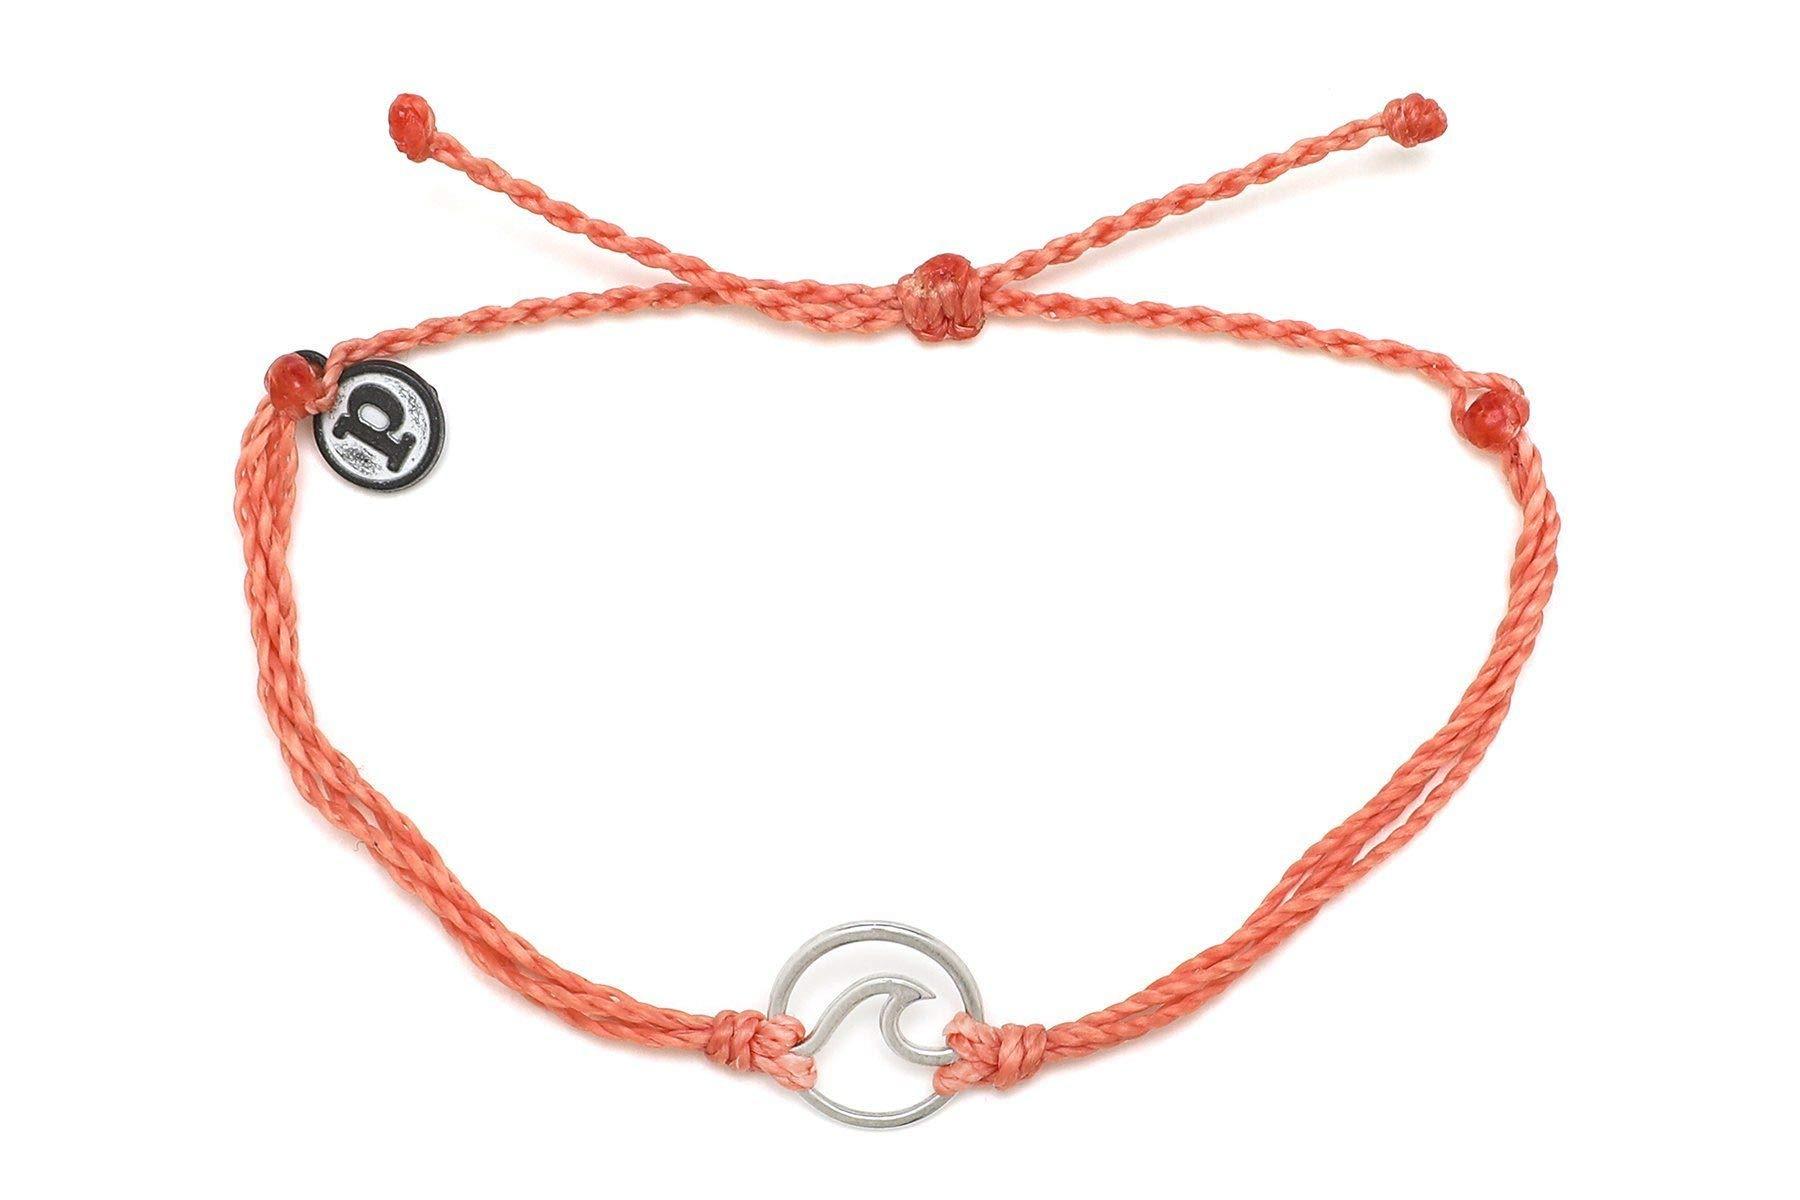 Pura Vida Silver Wave OG Salmon Bracelet - Silver Plated Charm, Adjustable Band - 100% Waterproof